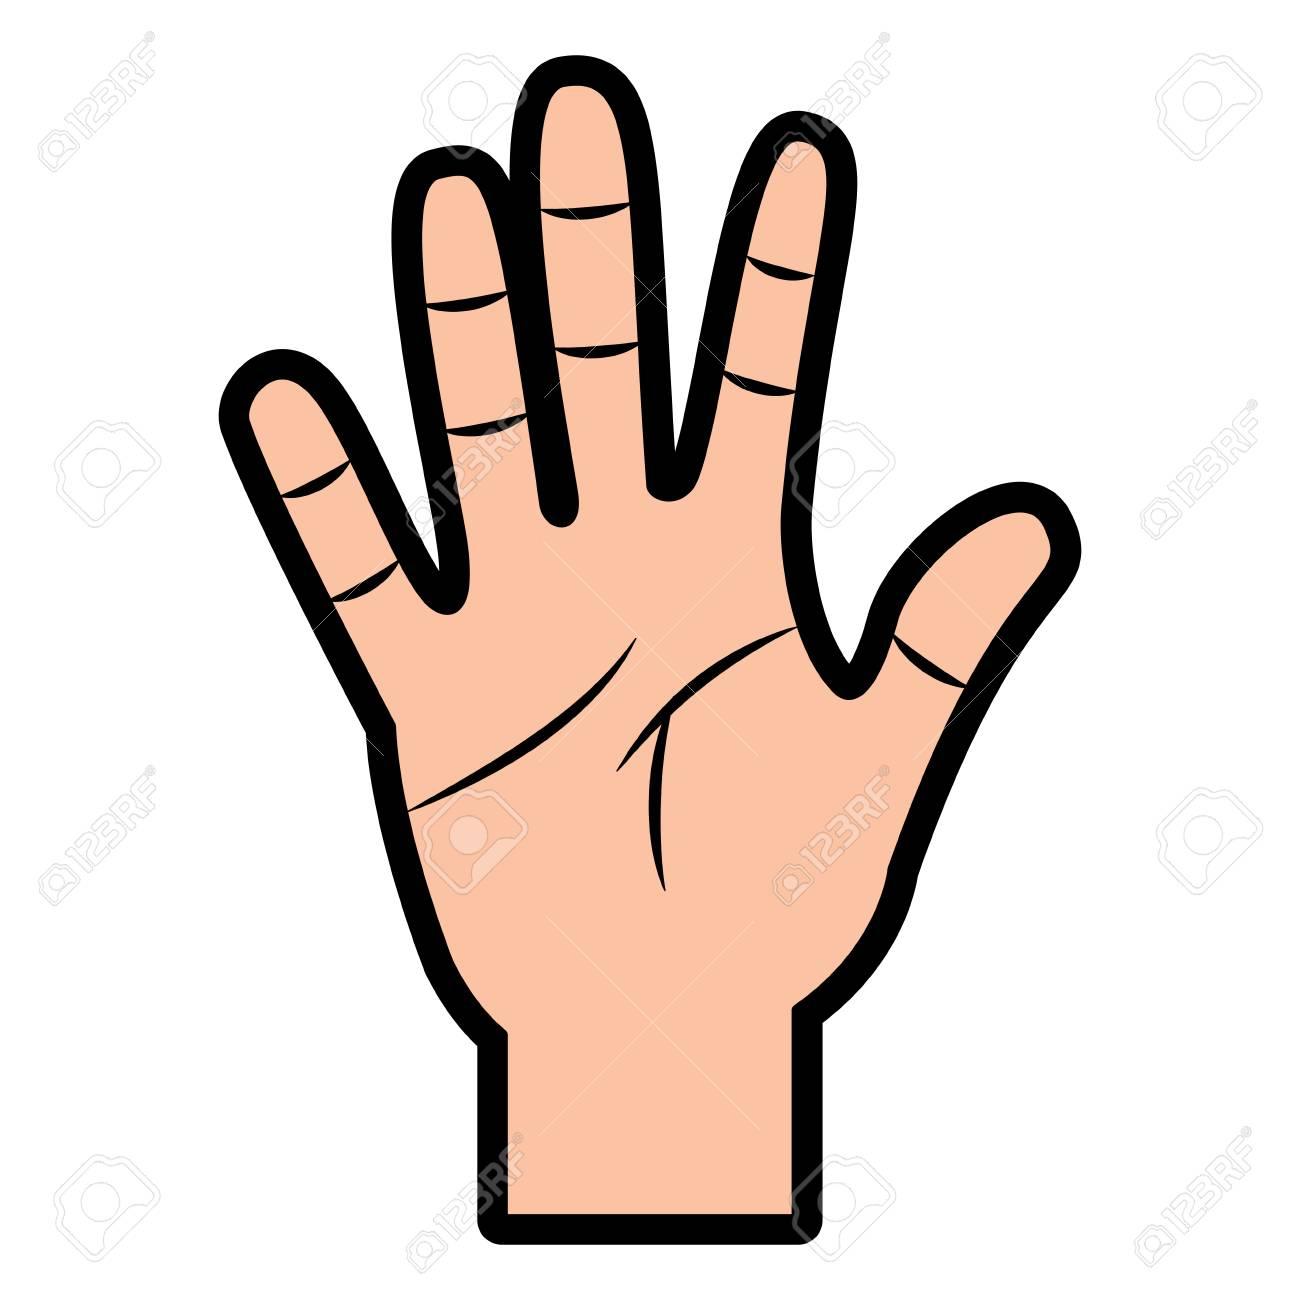 5 Fingers Clipart.